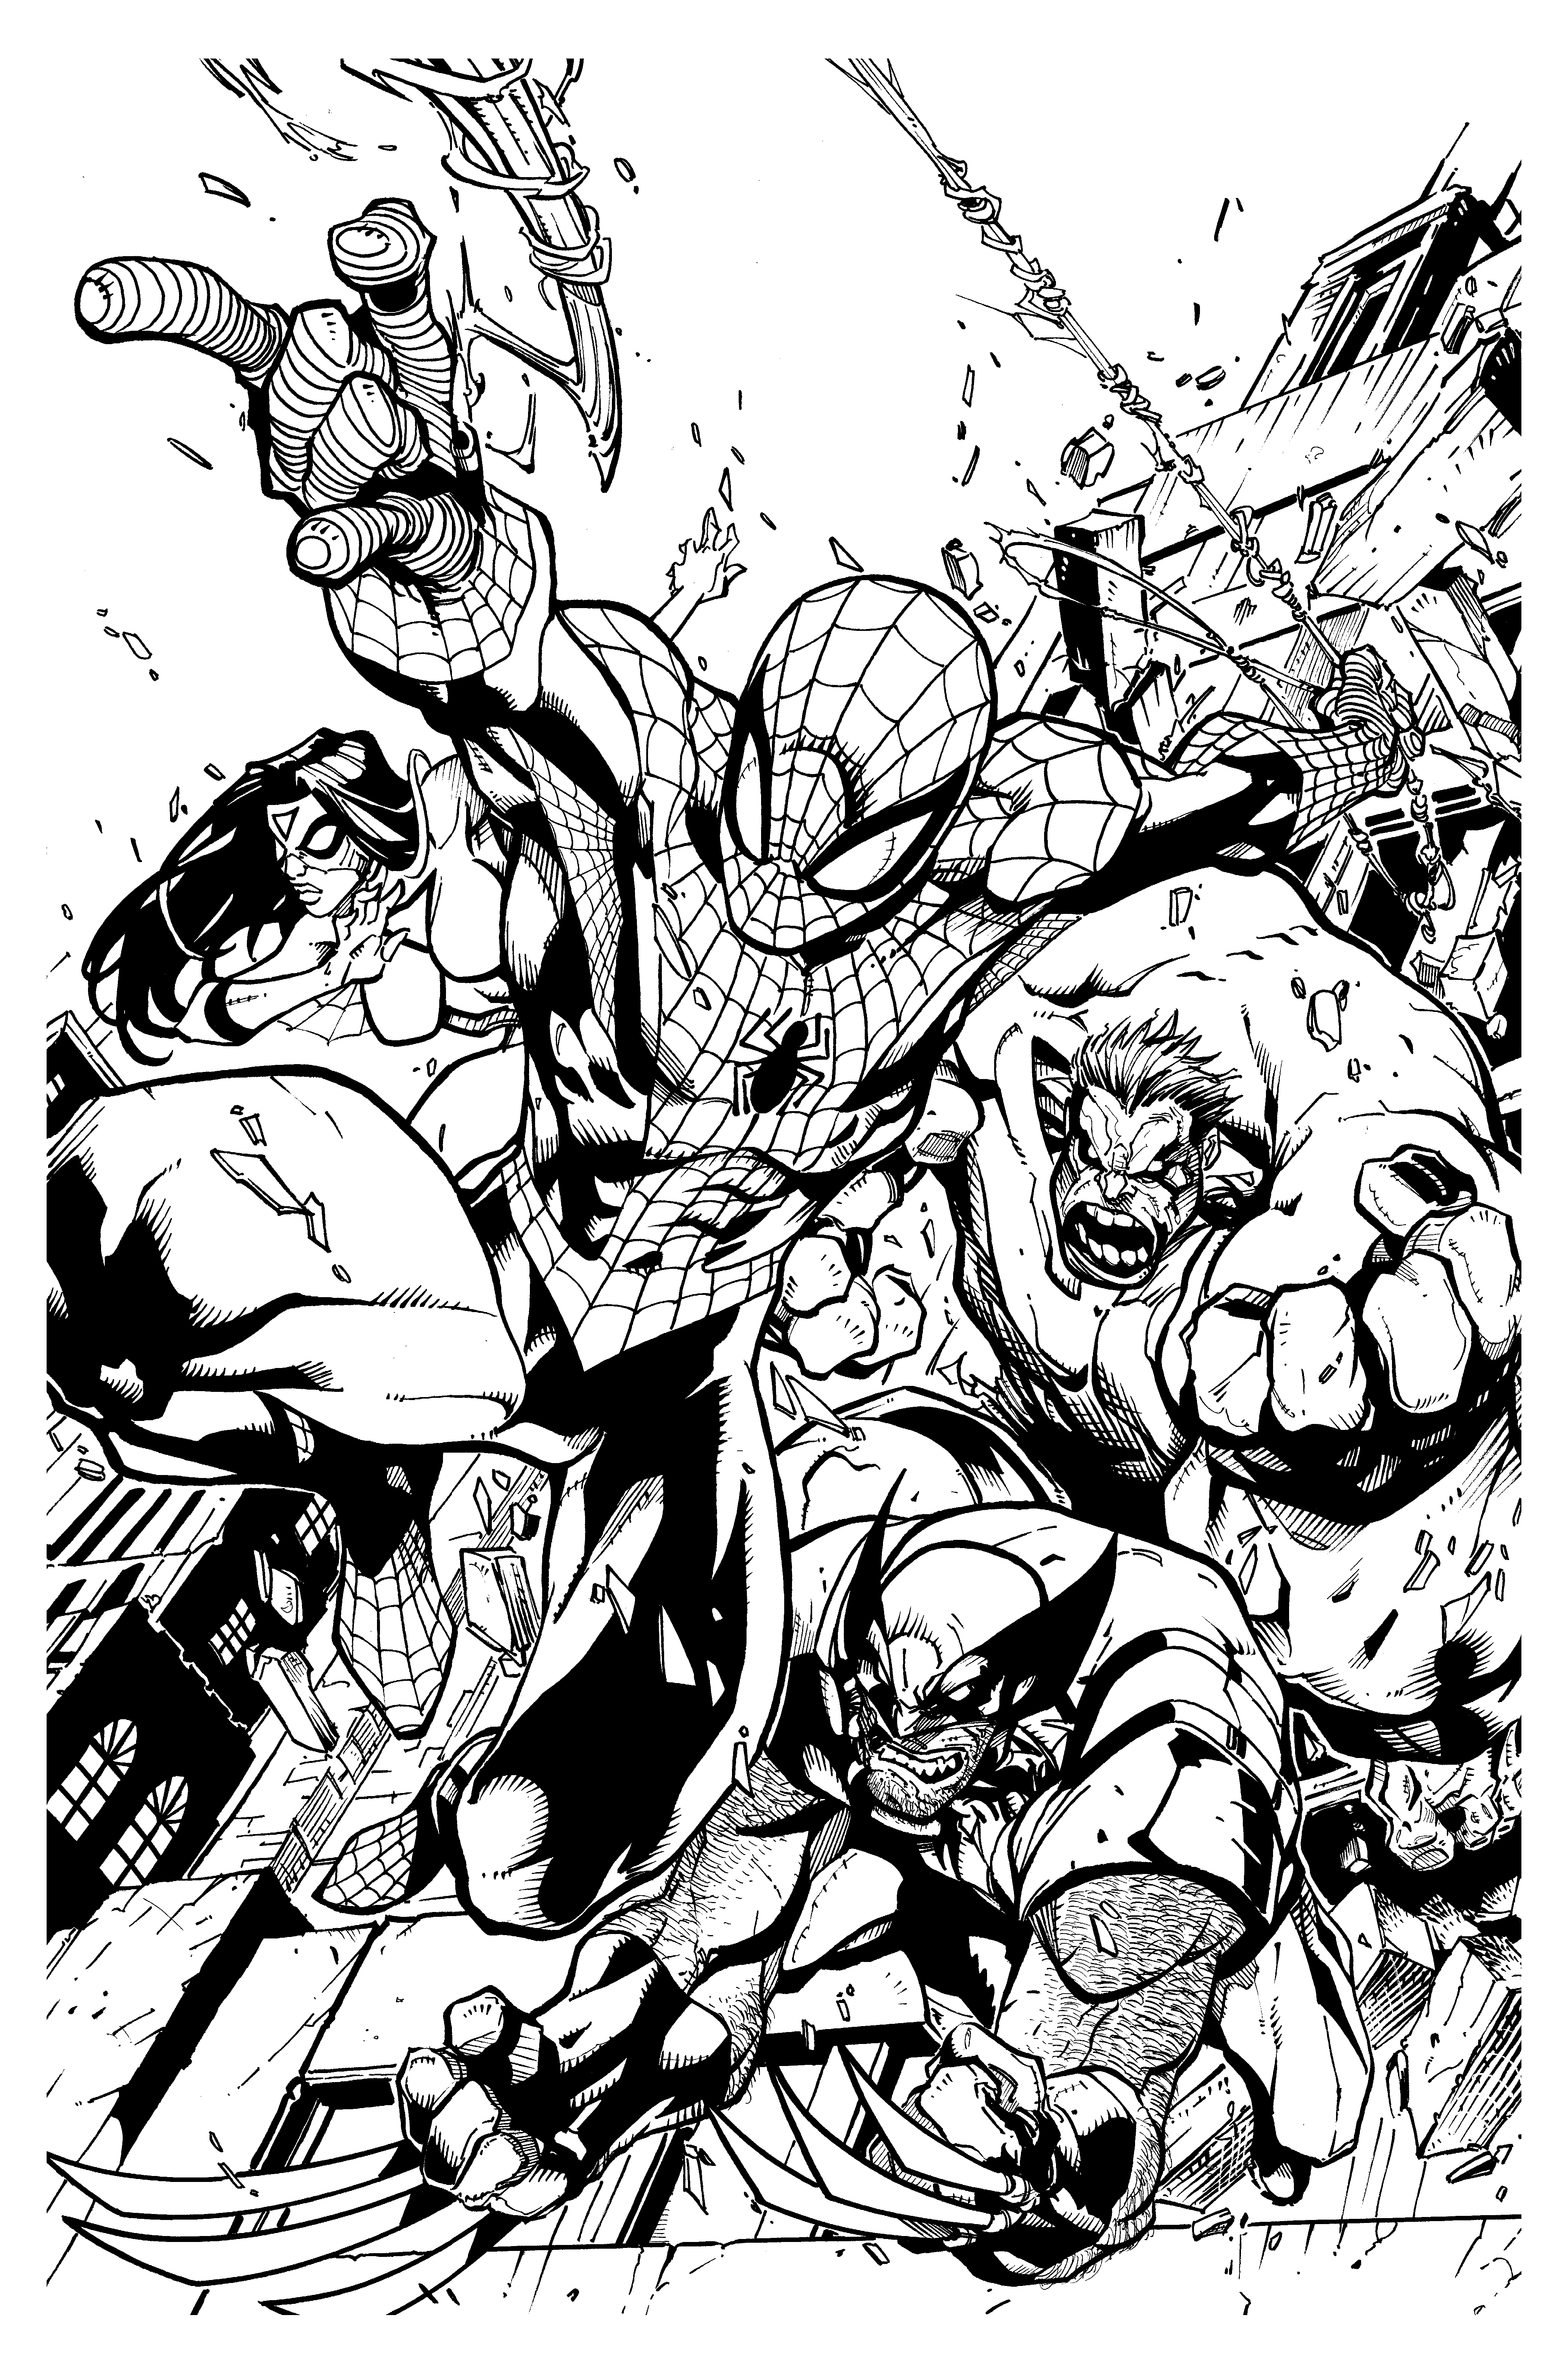 Comics spiderman wolverine mattjamescomicarts - Books Adult Coloring ...